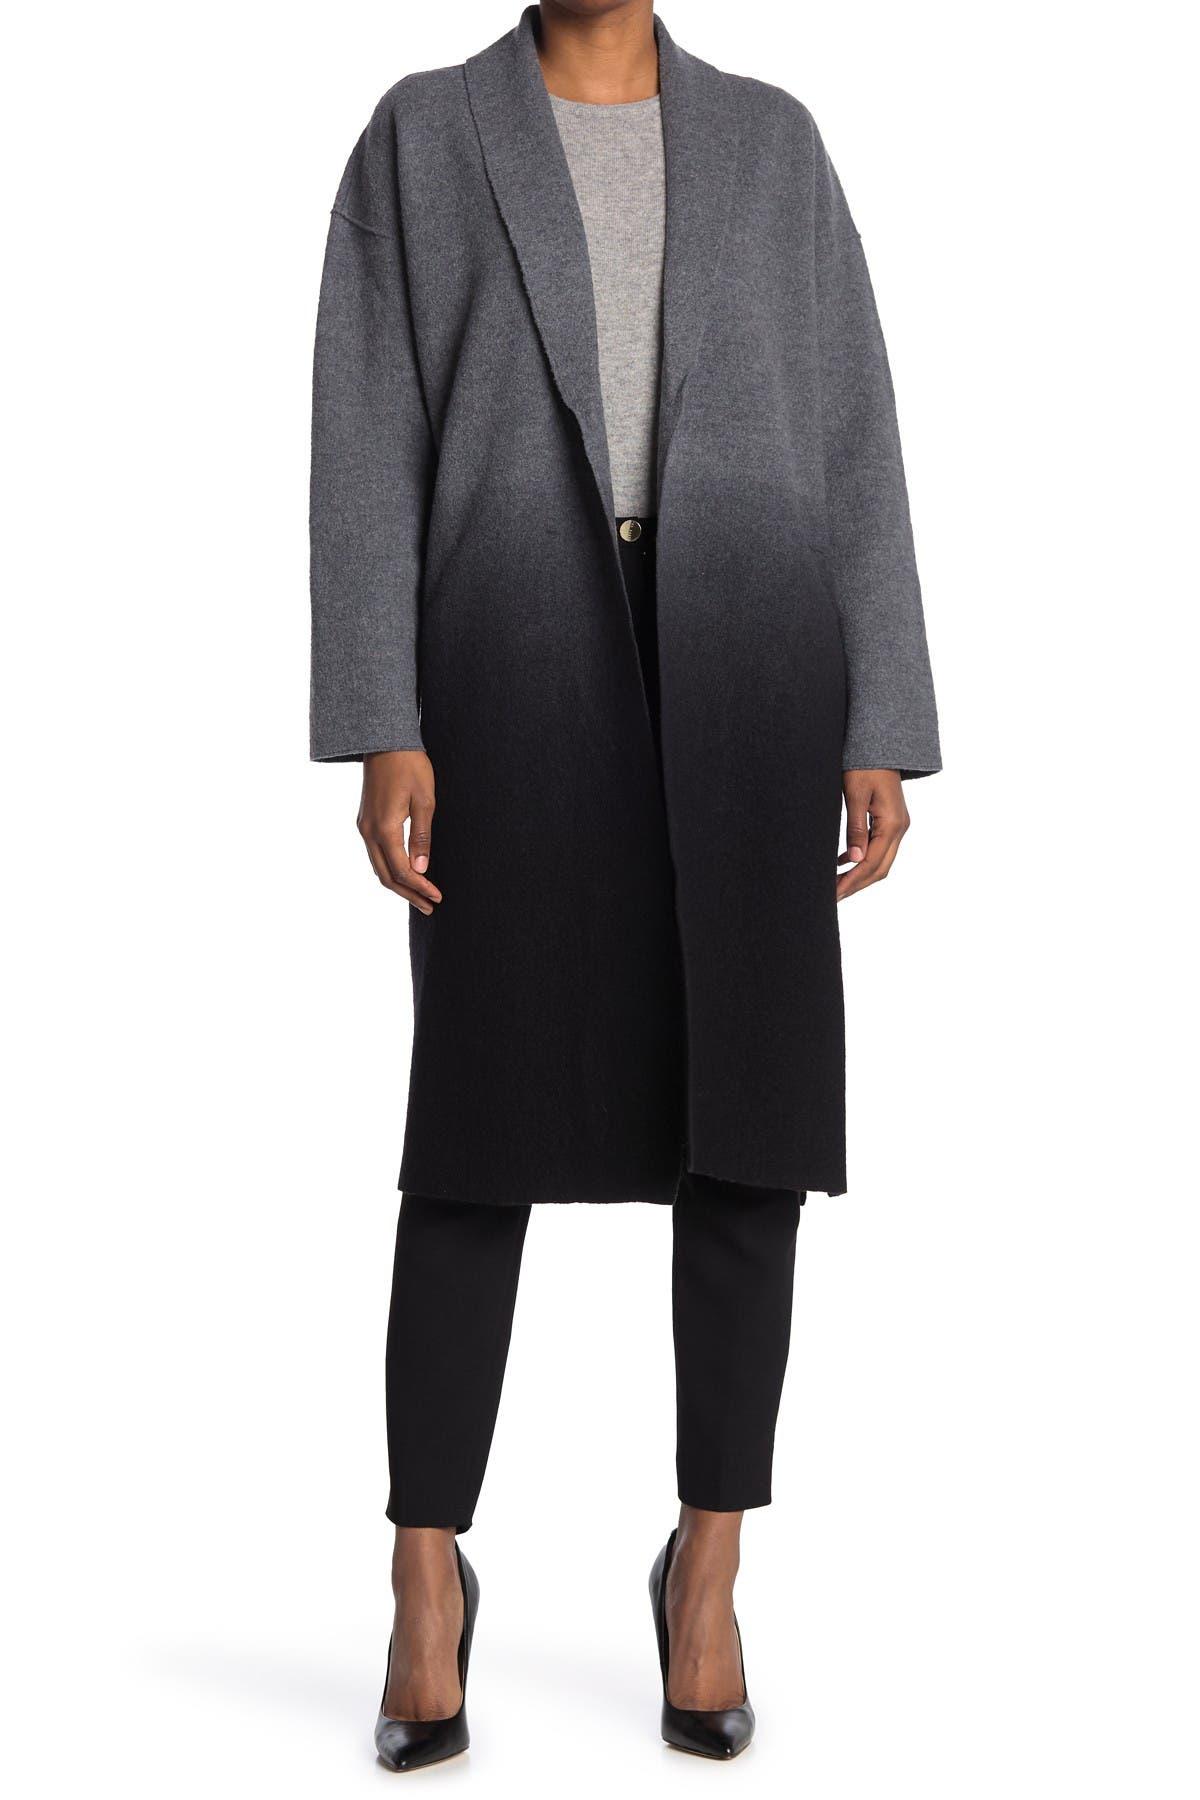 Image of Eileen Fisher Ombre Open Front Coat